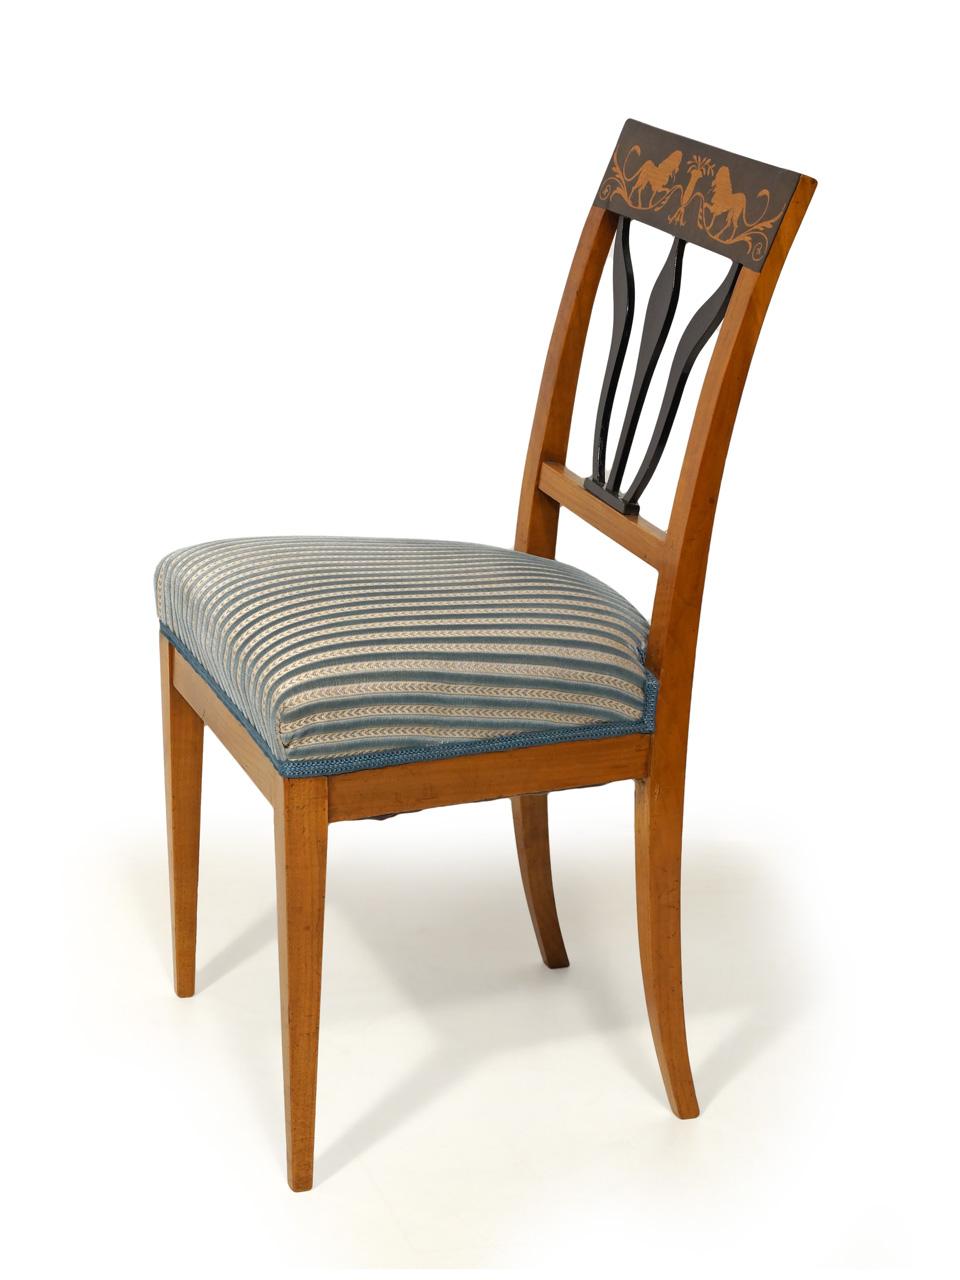 art nr 4173 biedermeierkirschbaumstuhl mit. Black Bedroom Furniture Sets. Home Design Ideas